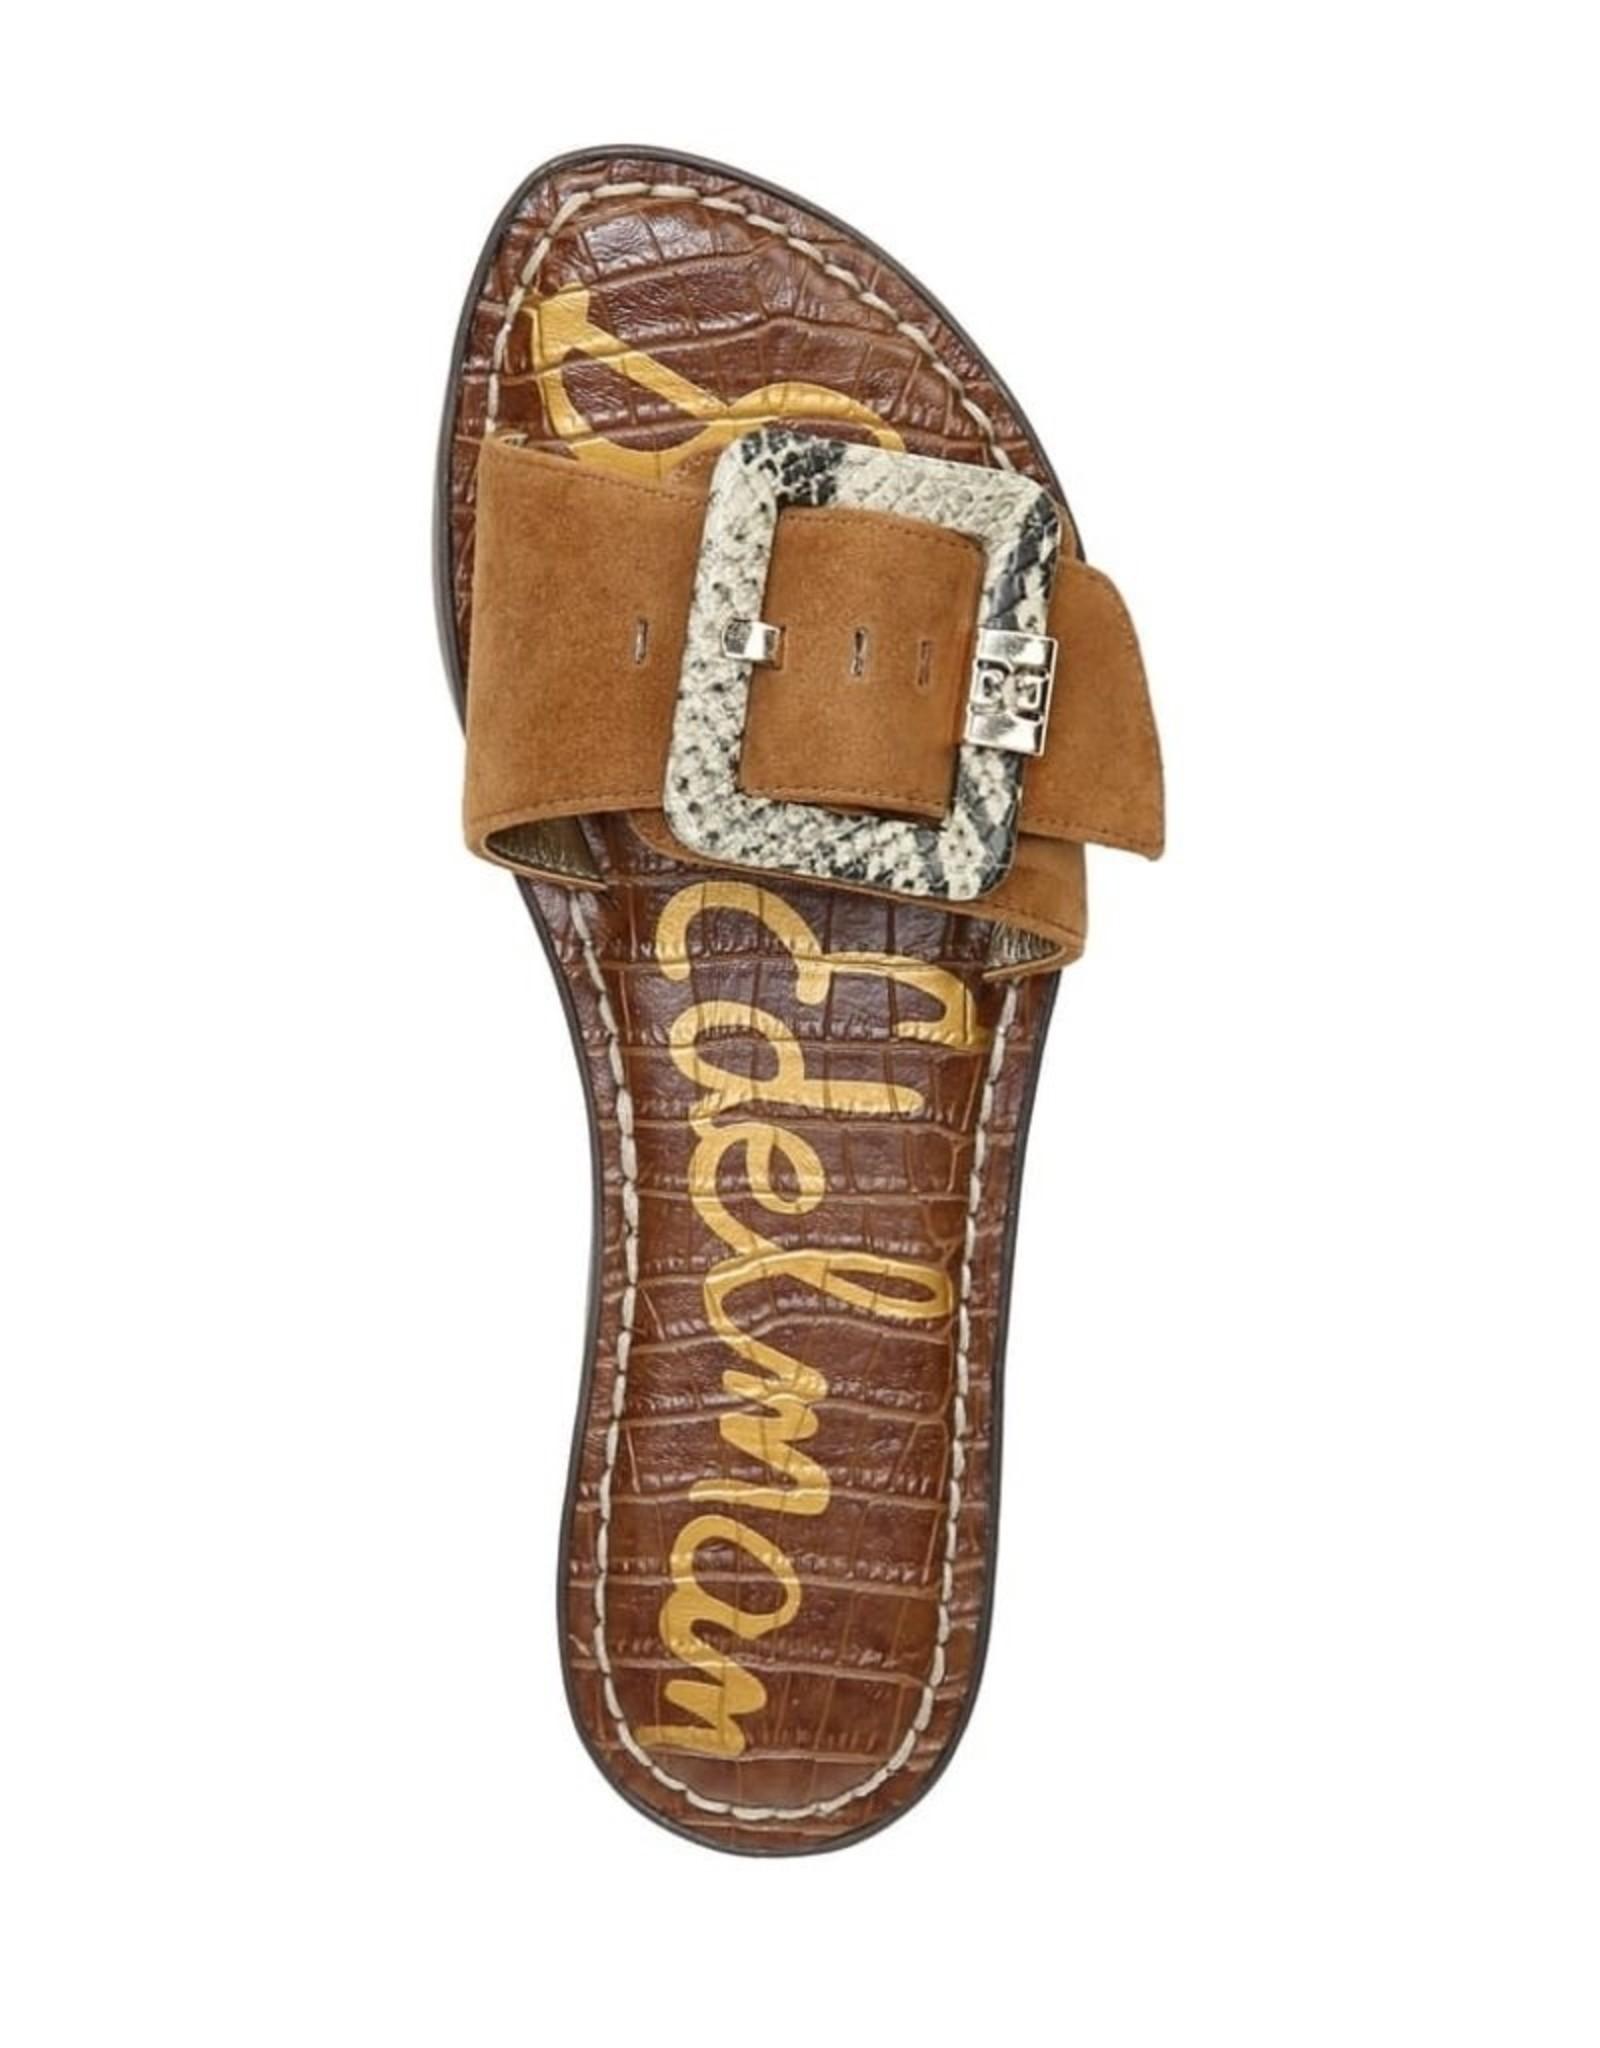 Sam Edelman Sam Edelman Granada Slide Sandal in Luggage Suede